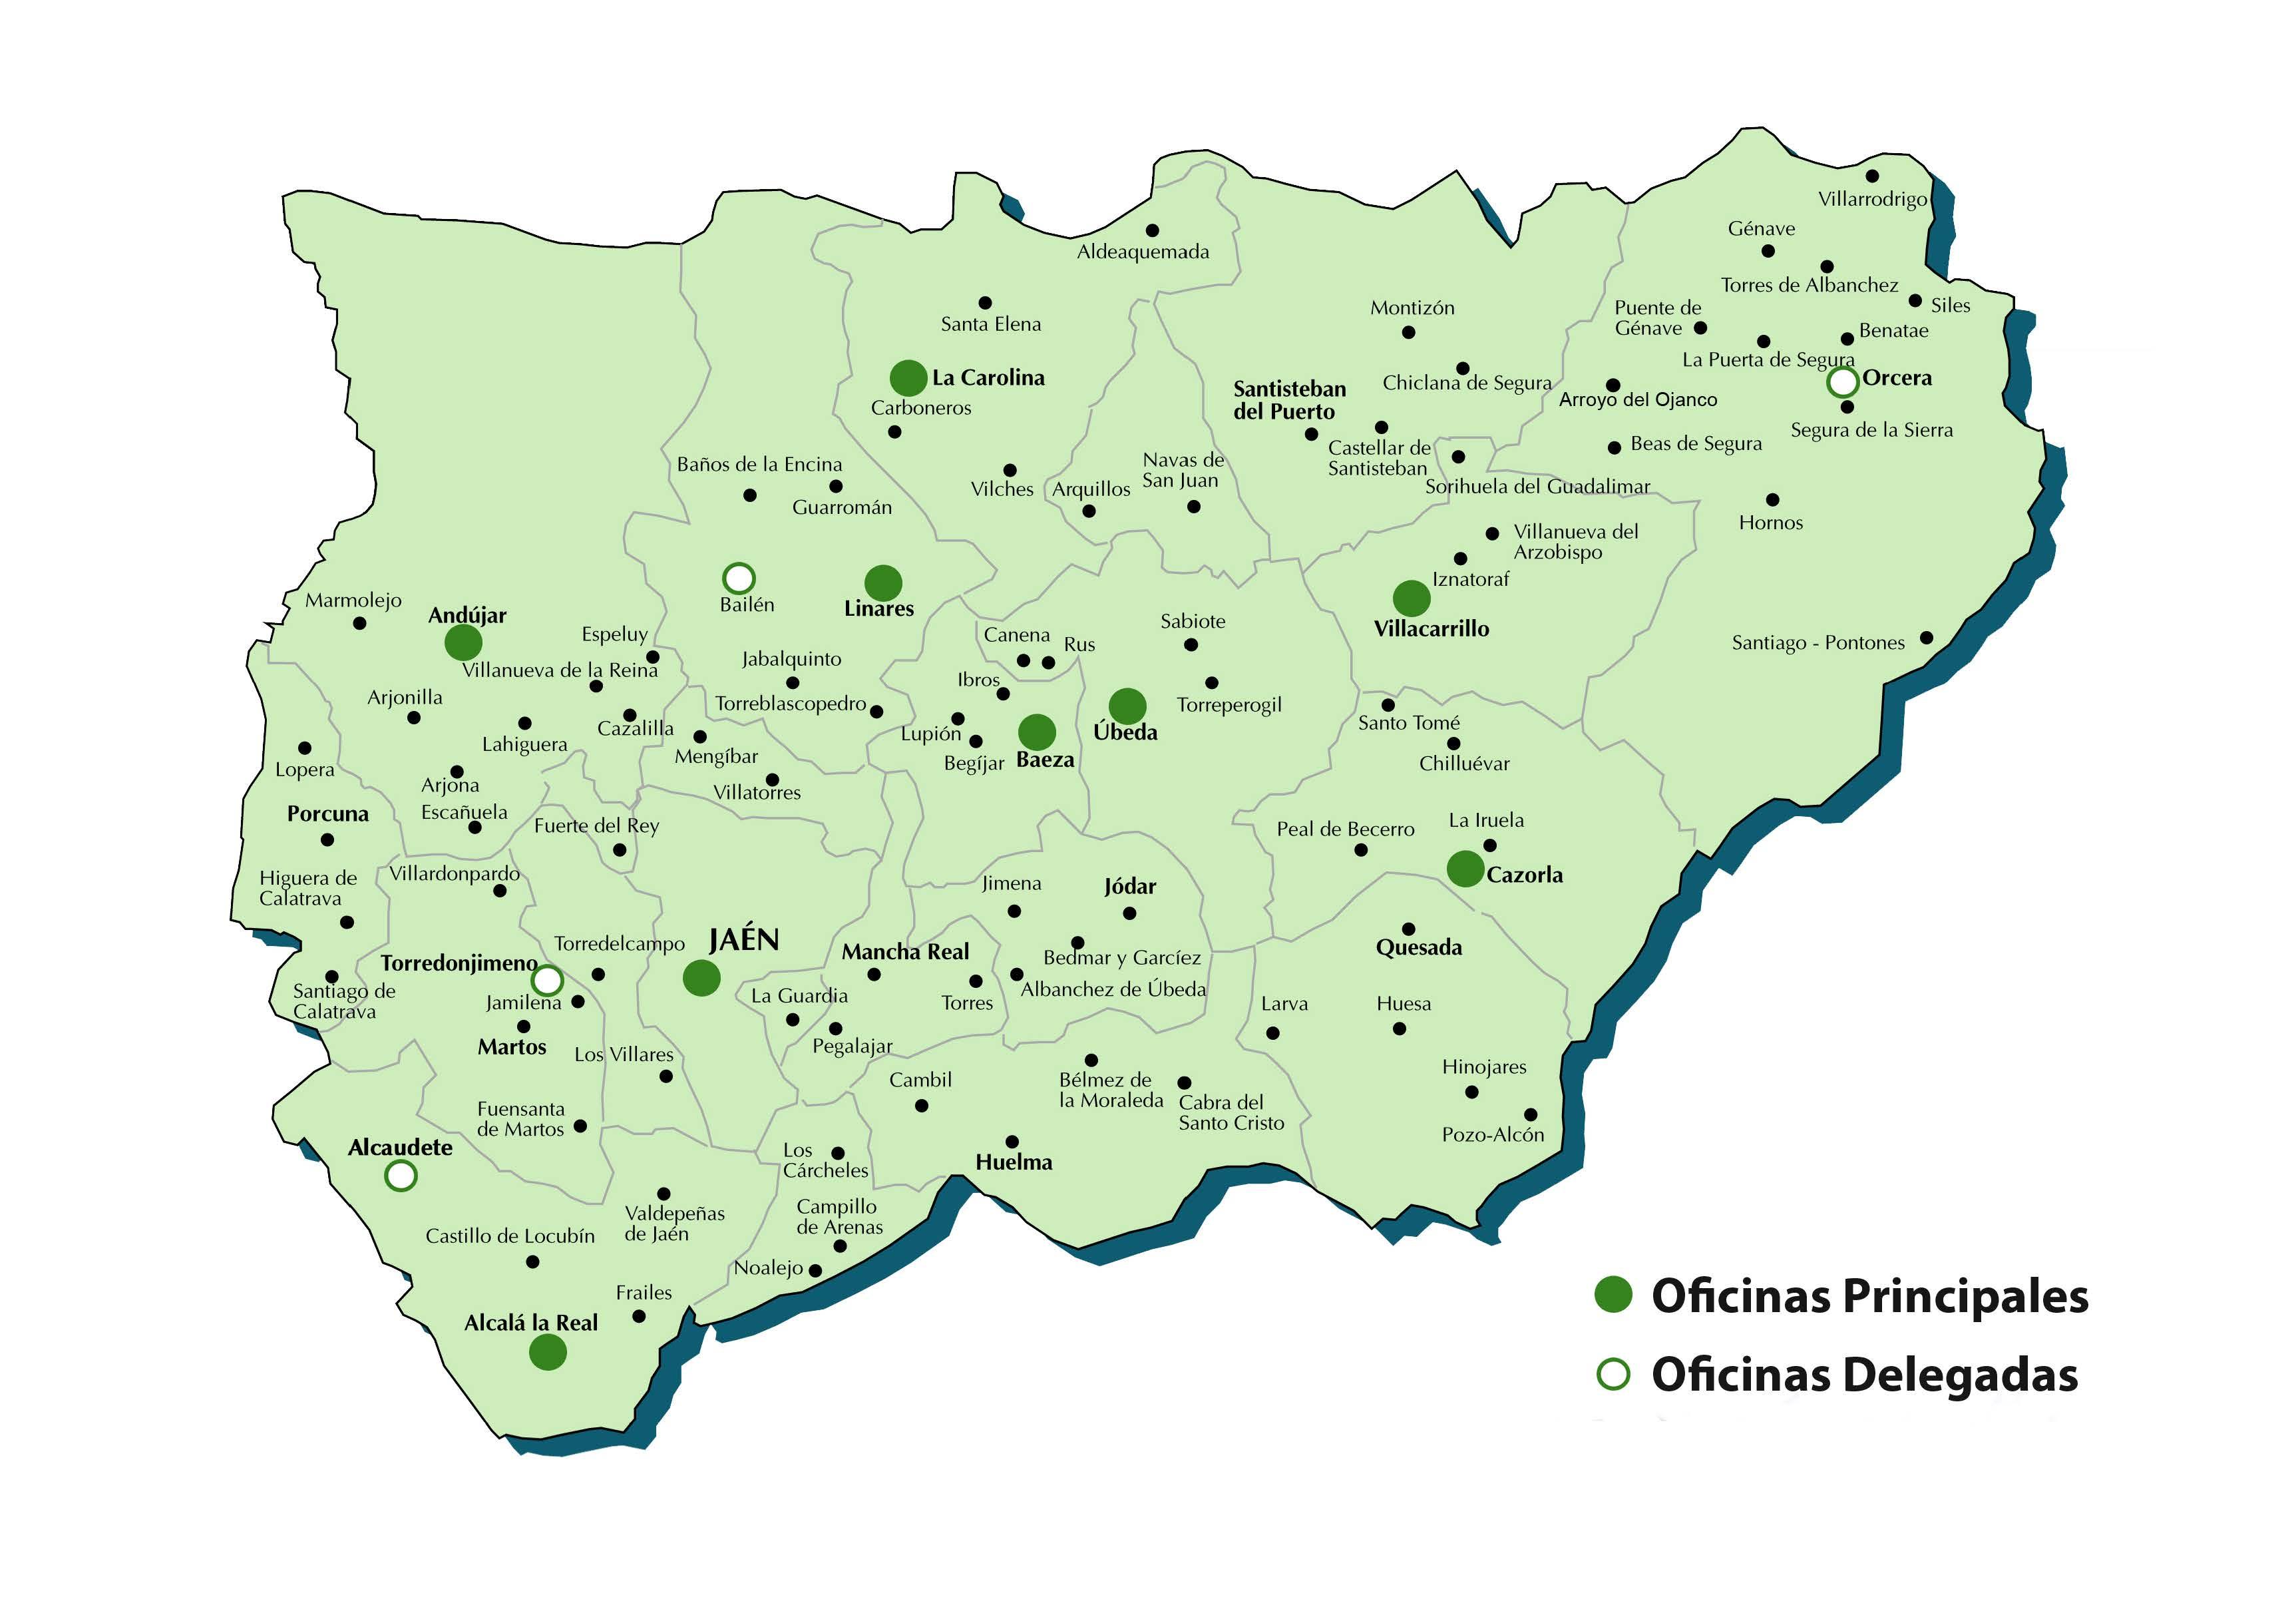 Diputacion De Jaen Mapa De Oficinas De Recaudacion